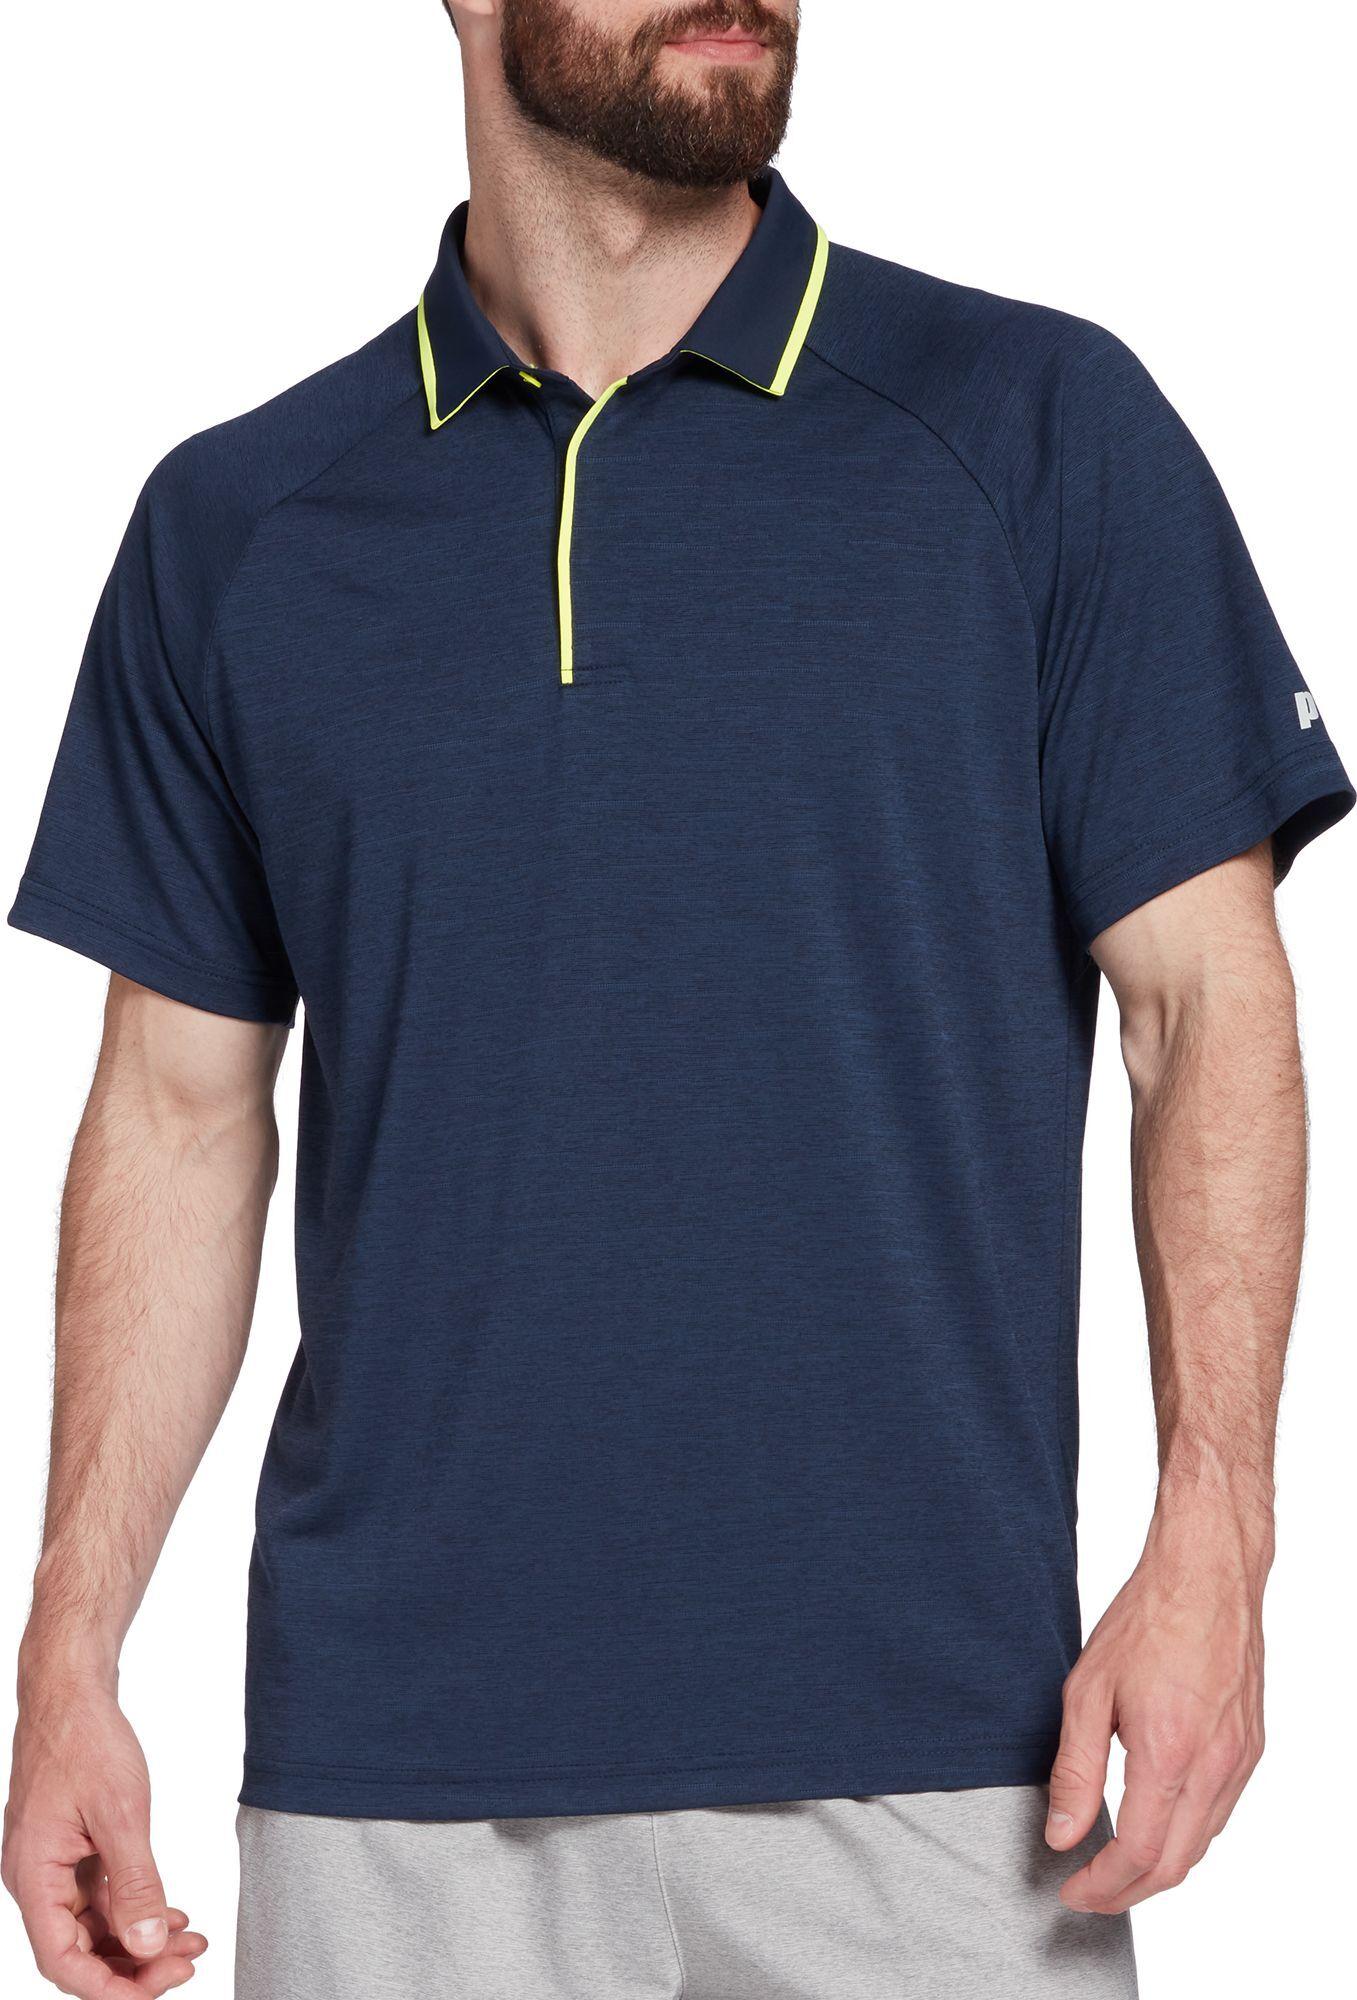 Prince Men's Fashion Short Sleeve Tennis Polo, Medium, Blue